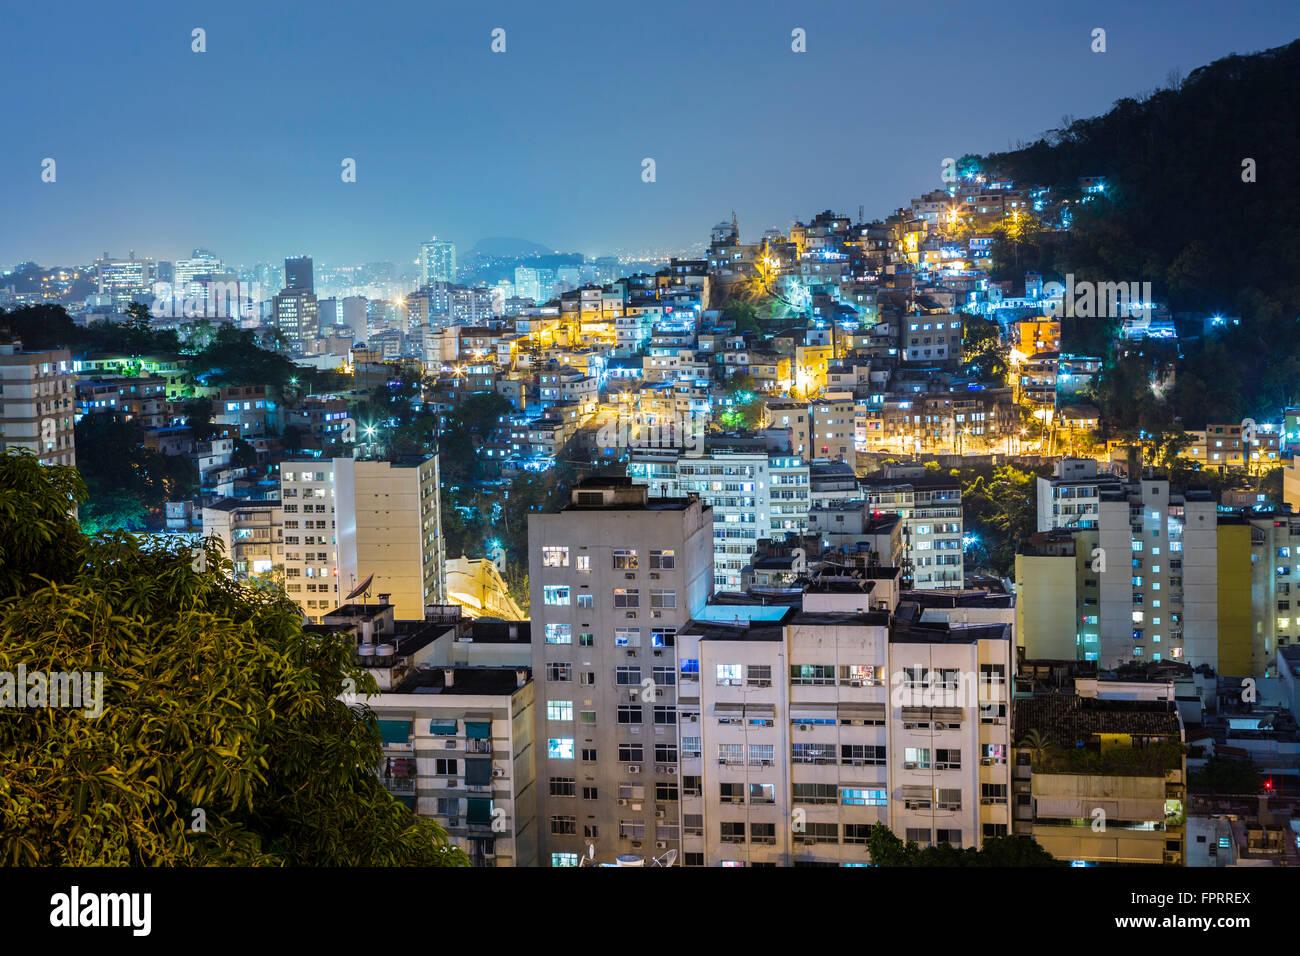 View of the Tabajaras favela and apartment blocks in urban Copacabana, Rio de Janeiro, Brazil Stock Photo